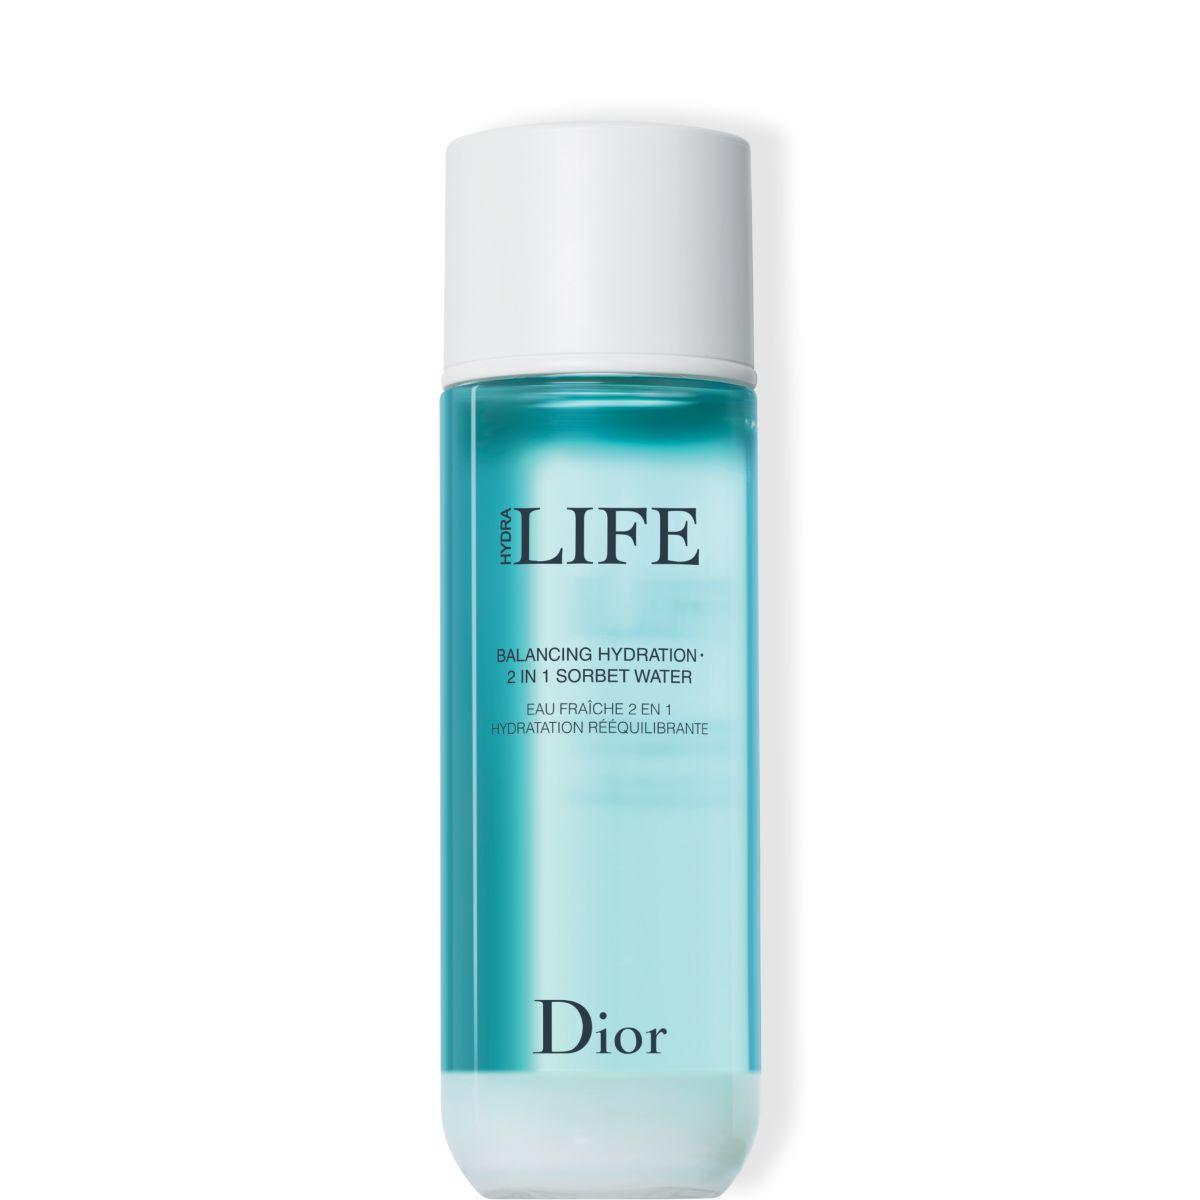 Dior - Dior Hydra Life - Eau Fraîche 2 en 1 Hydratation Rééquilibrante - 175 ml